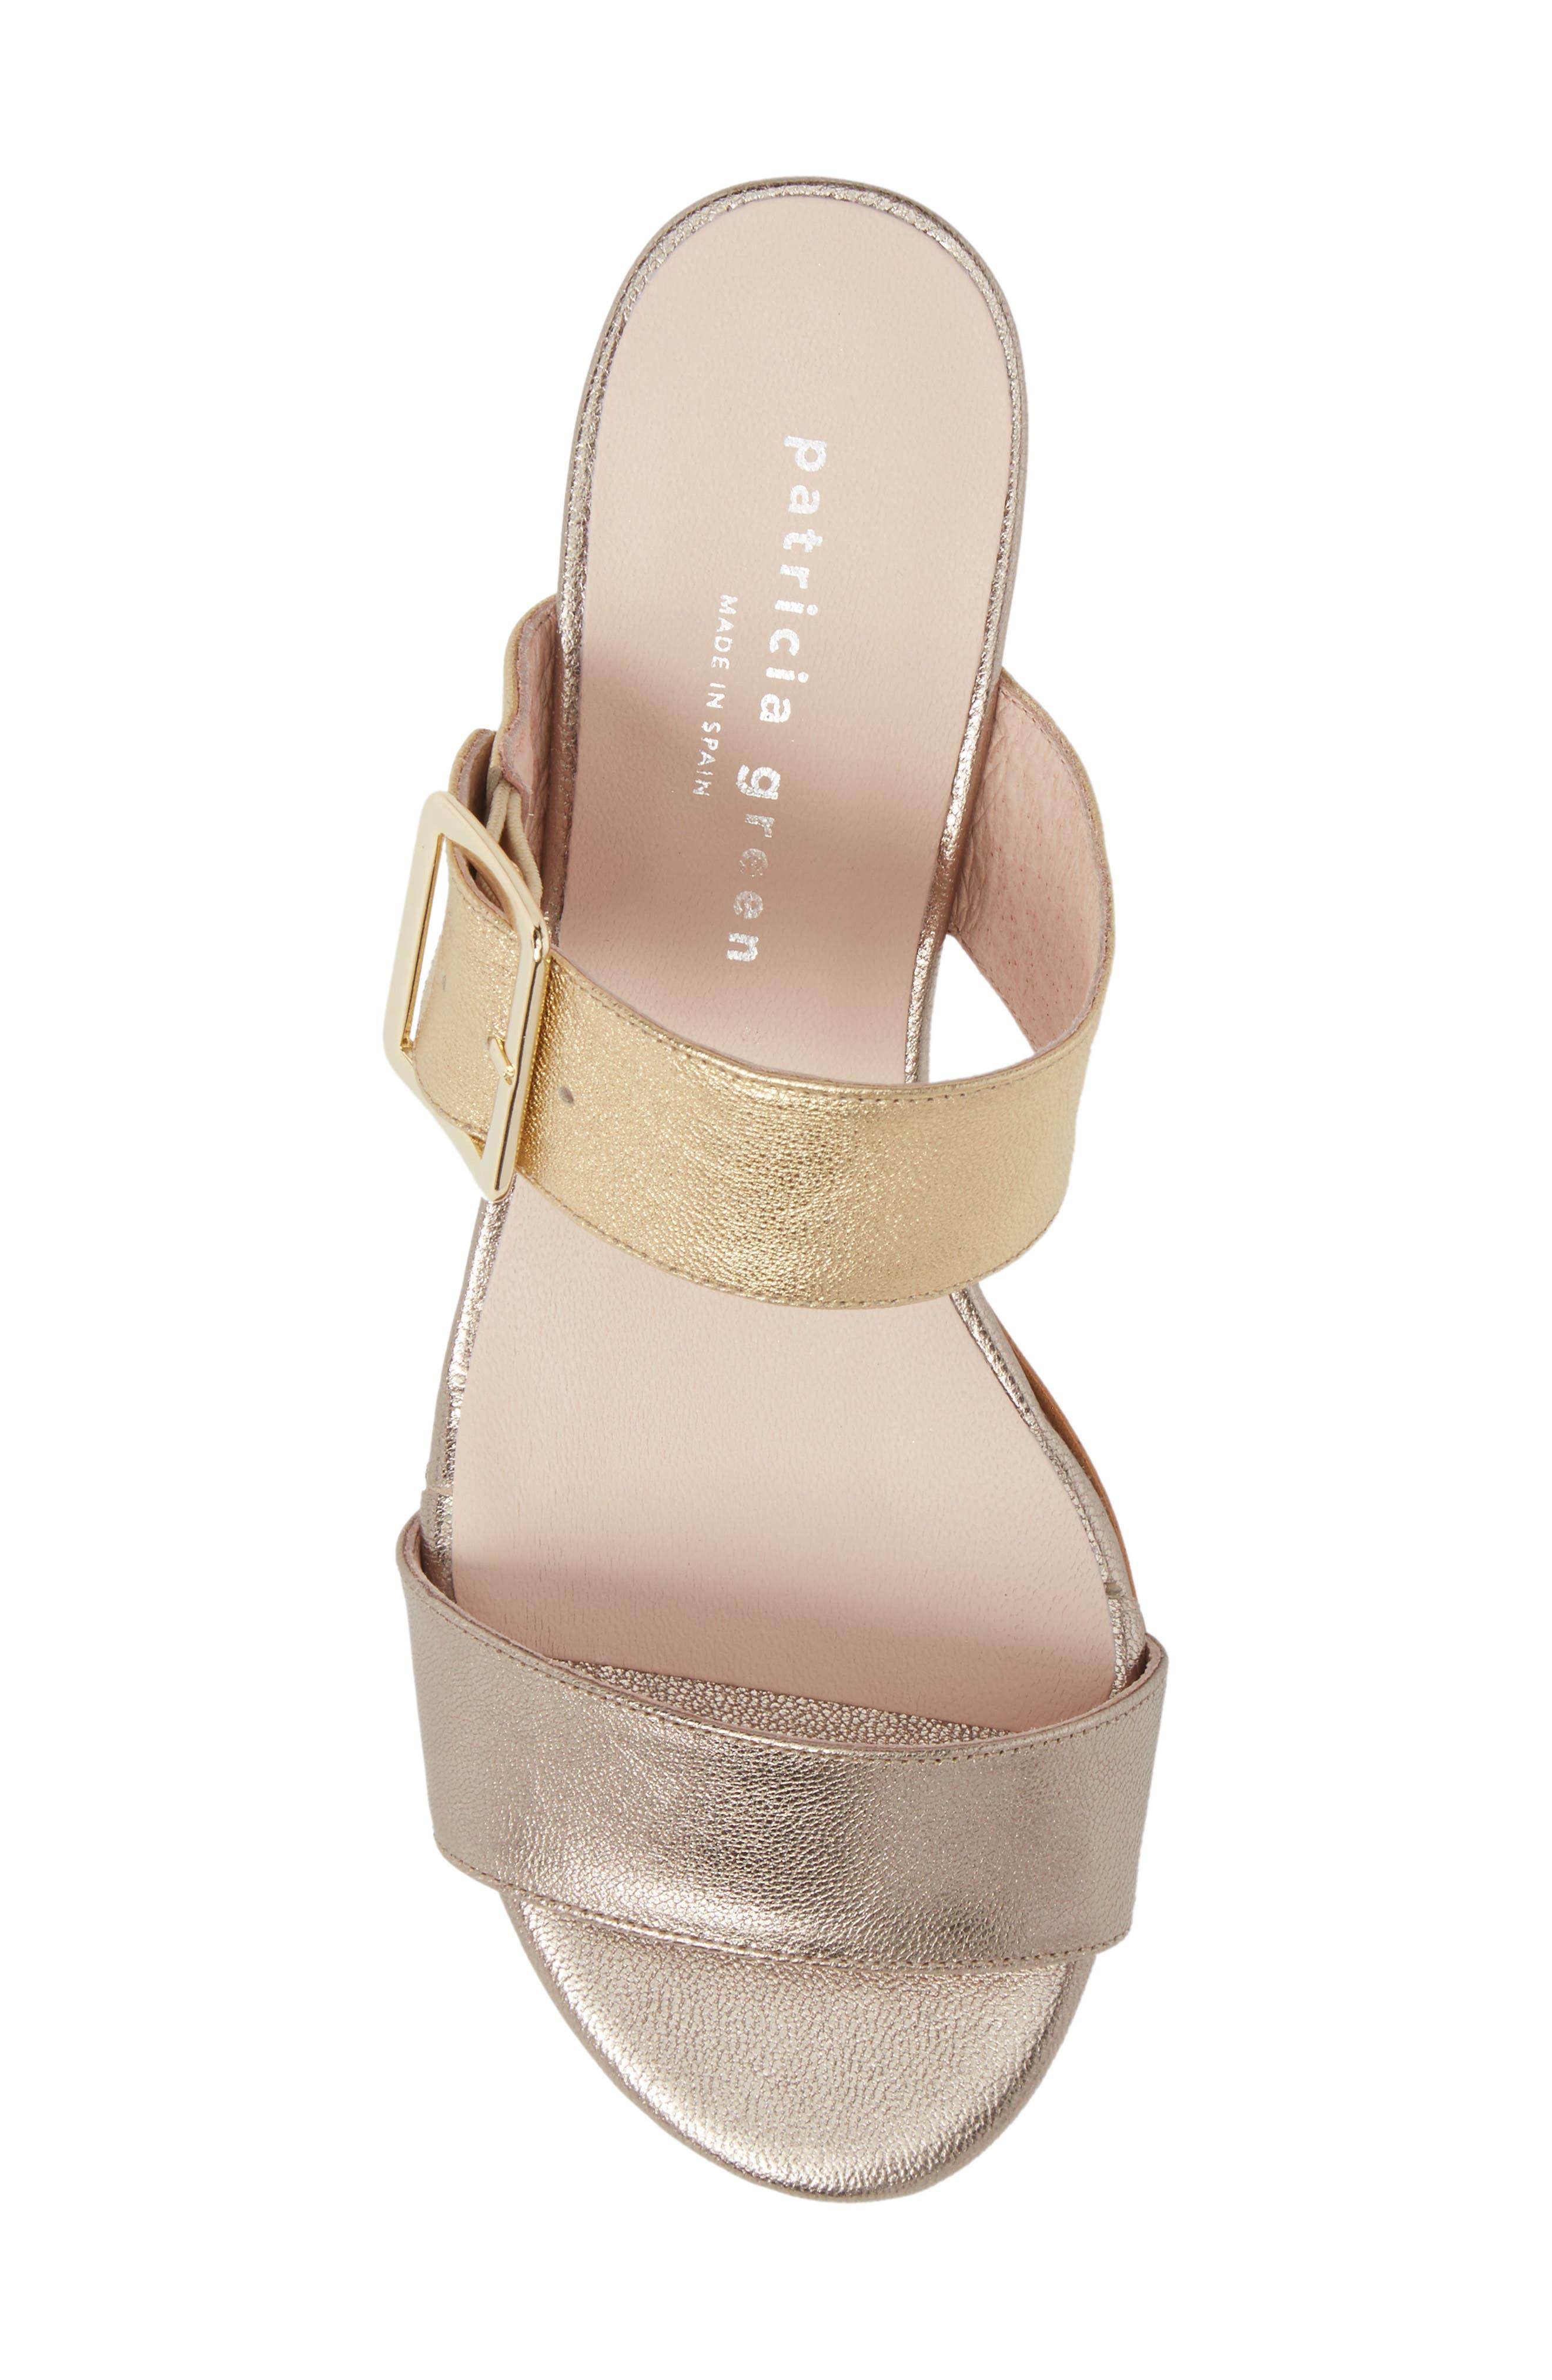 Ruth Slide Sandal,                             Alternate thumbnail 5, color,                             Gold/ Bronze Leather